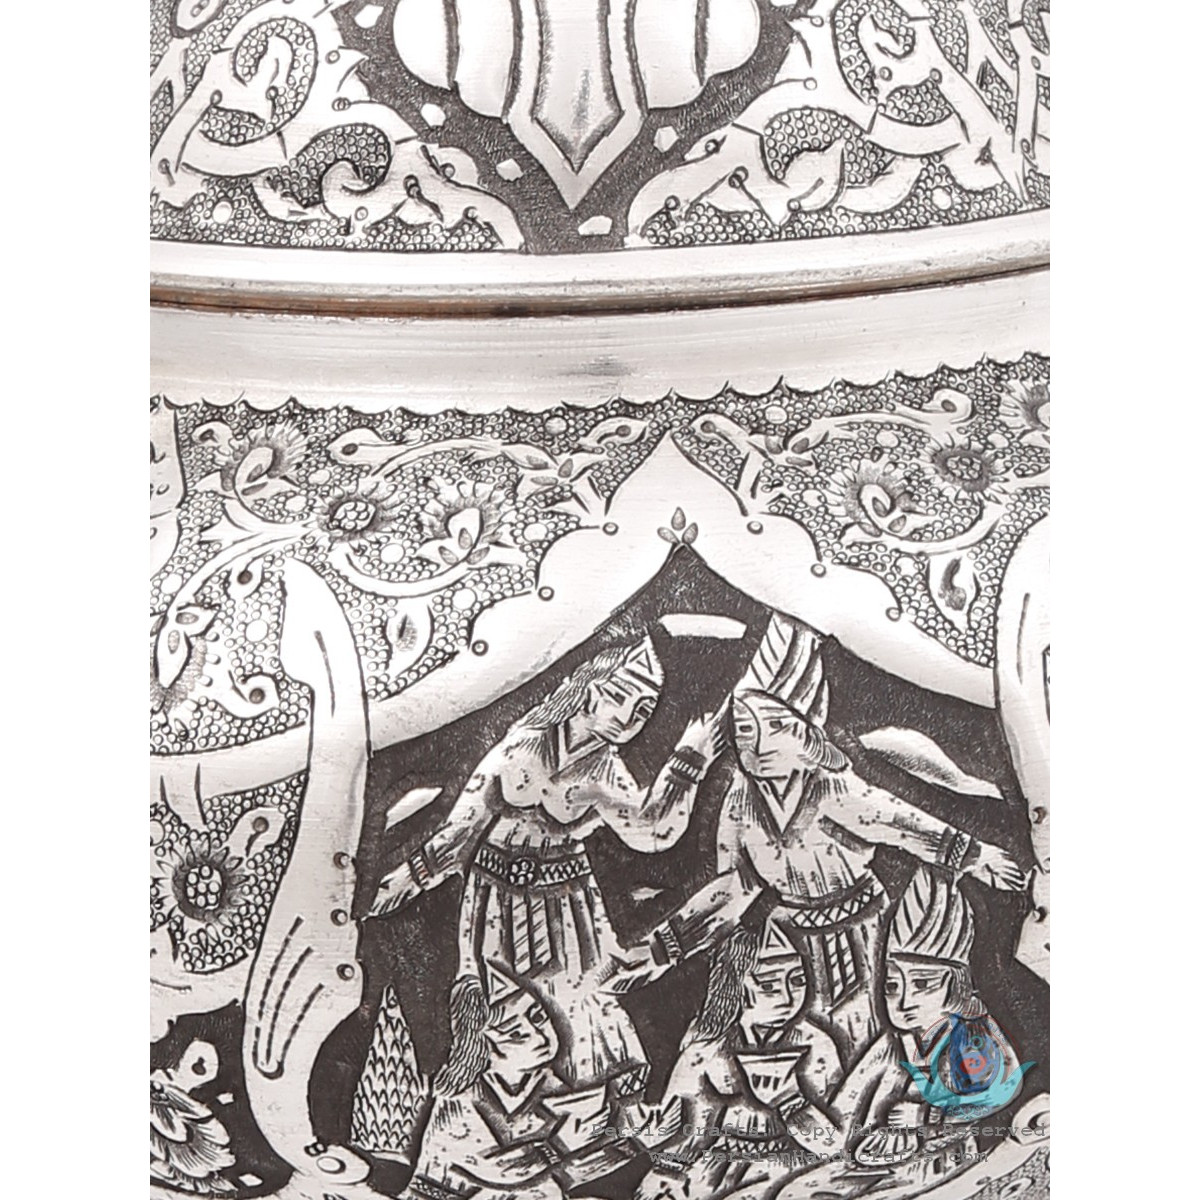 Traditional Handgraved Persian Banquet on Pedestal Dish - HGL3901-Persian Handicrafts